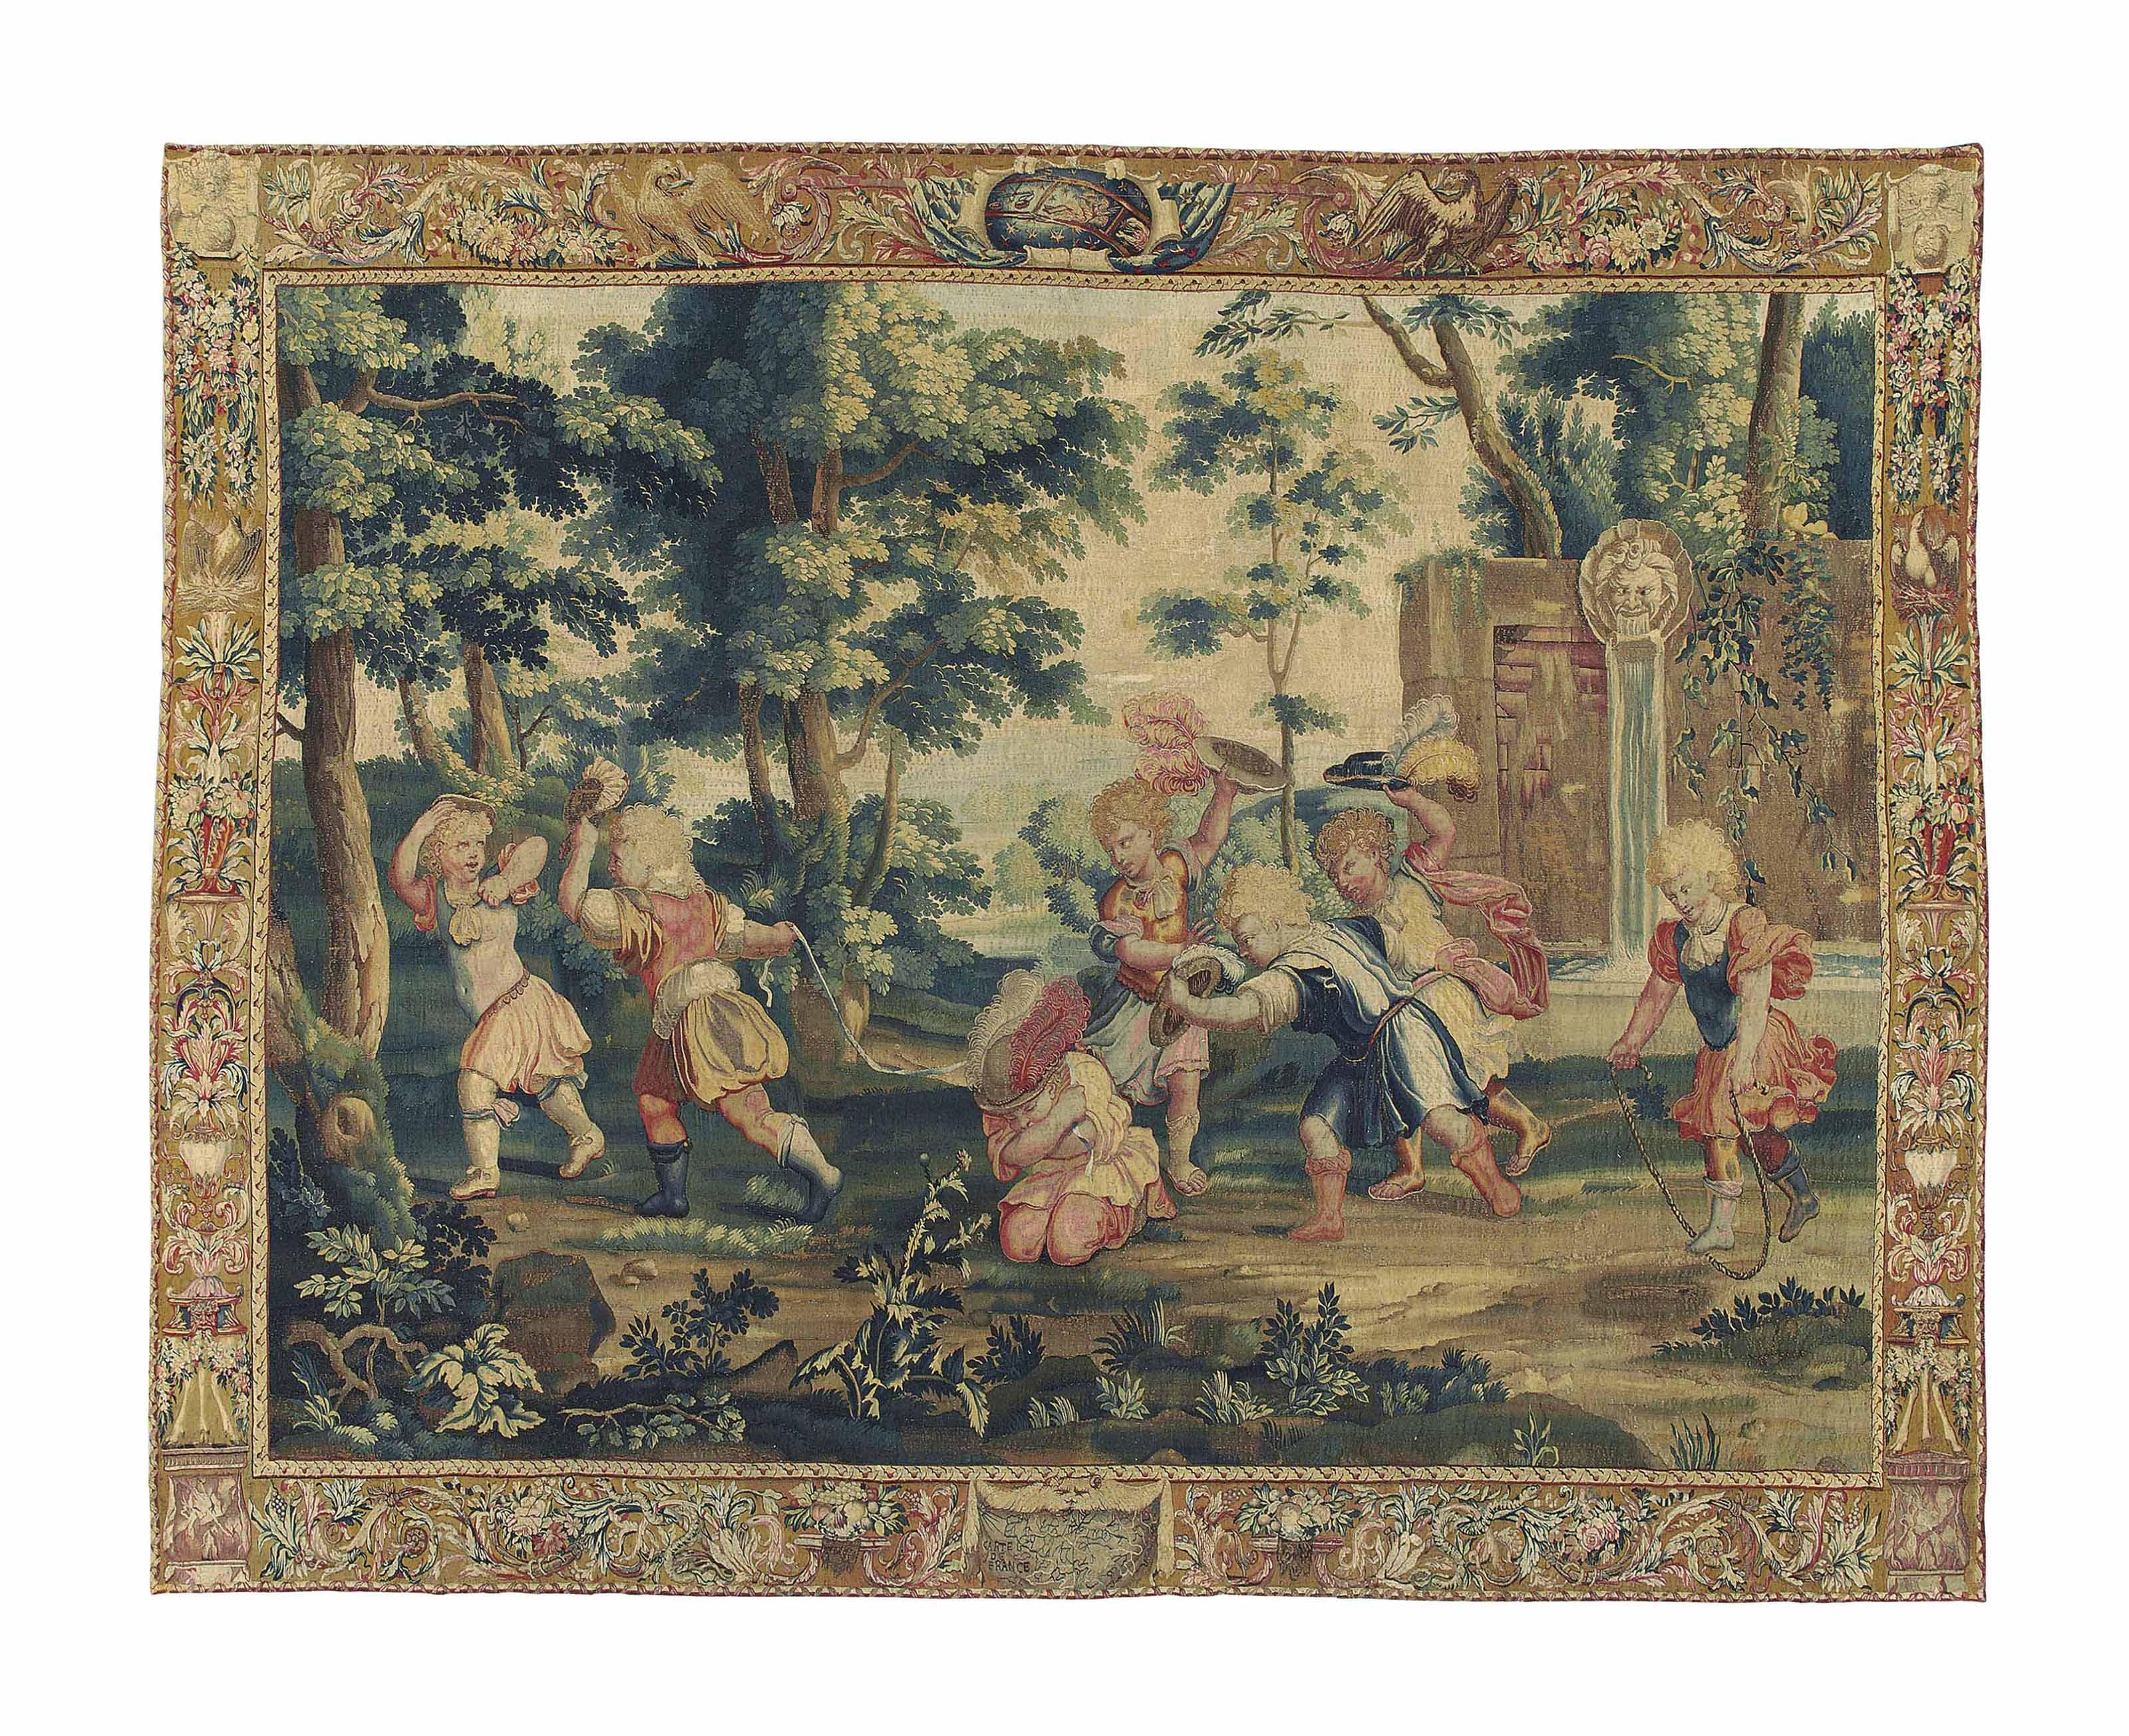 A LOUIS XIV PASTORAL TAPESTRY